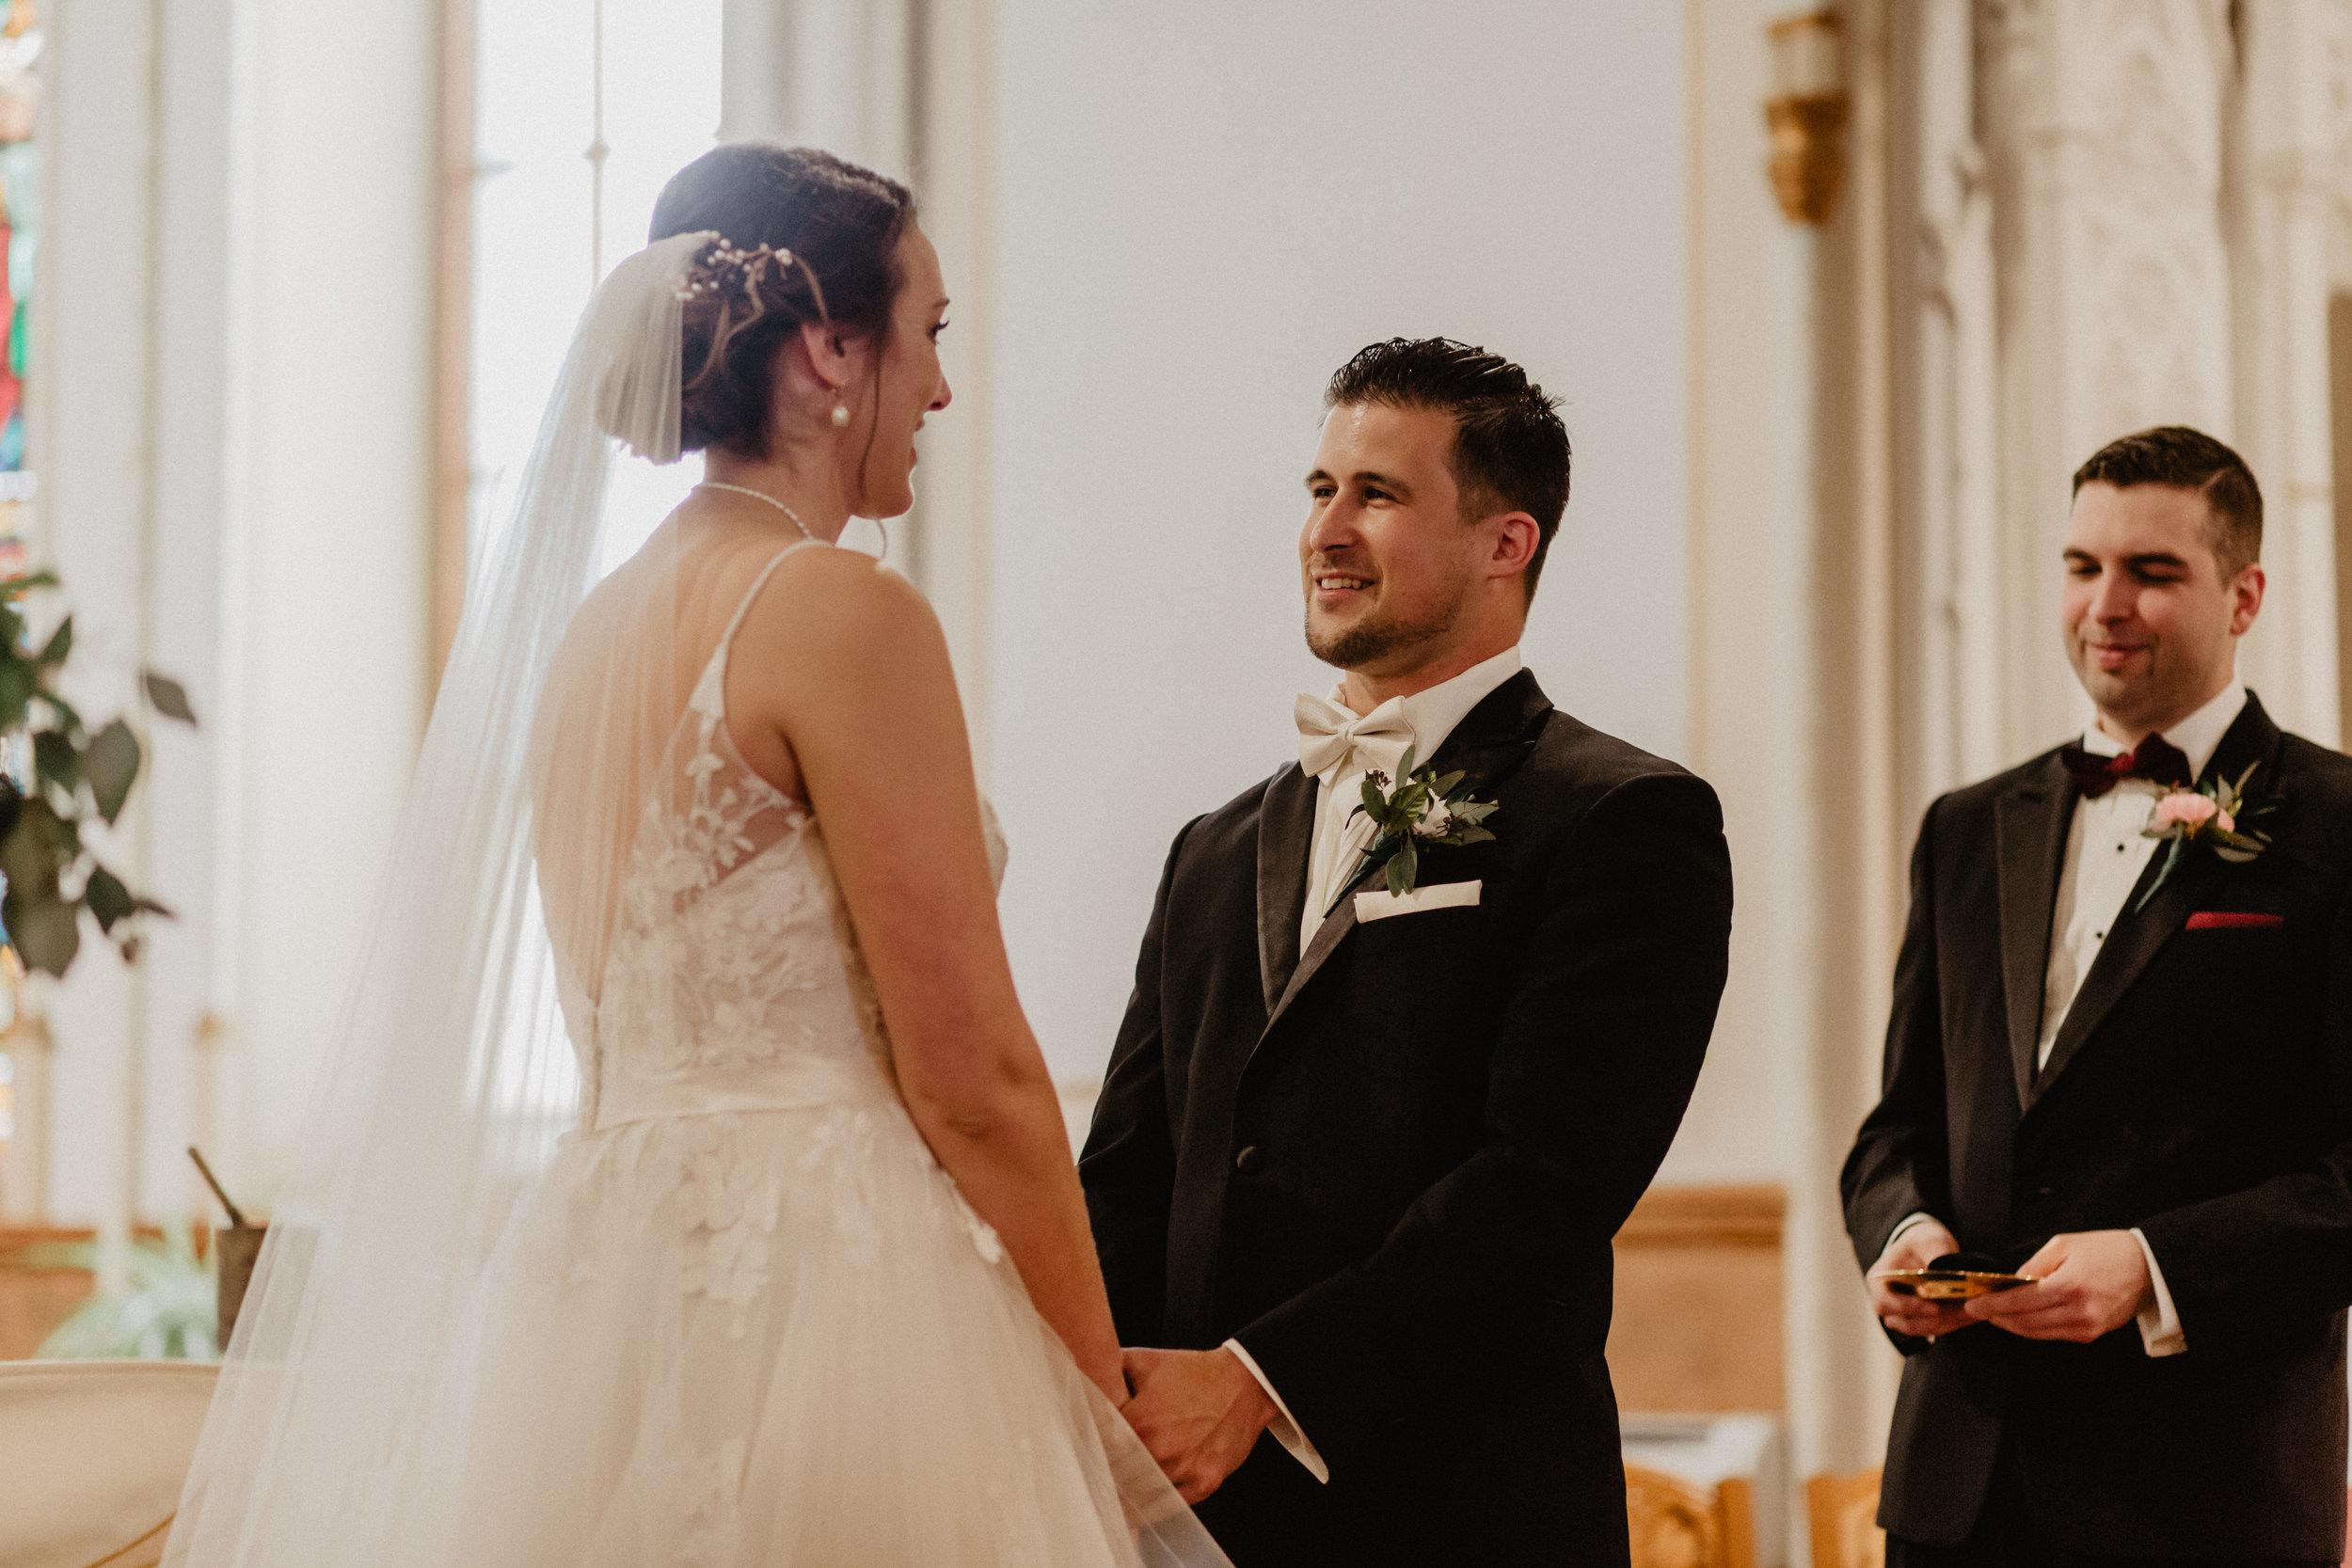 upstate_ny_wedding-29.jpg